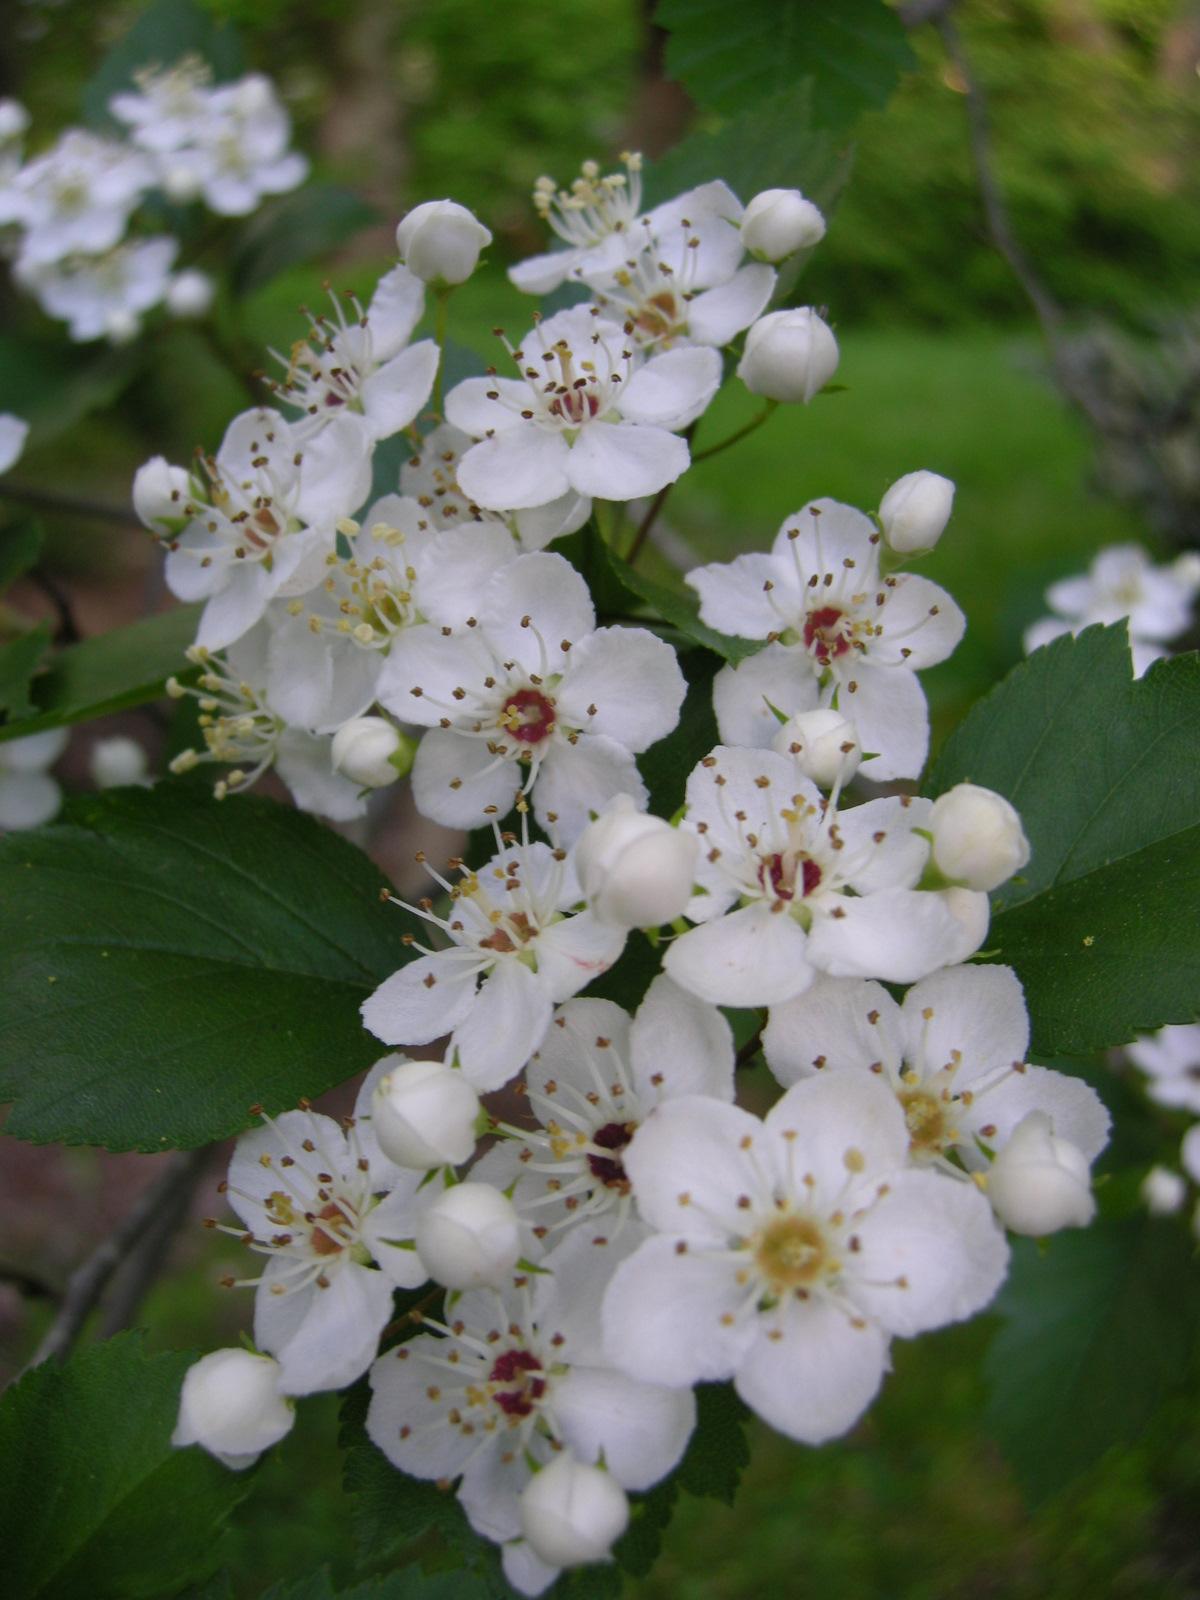 Flowers that bloom in the winter in missouri - Flower